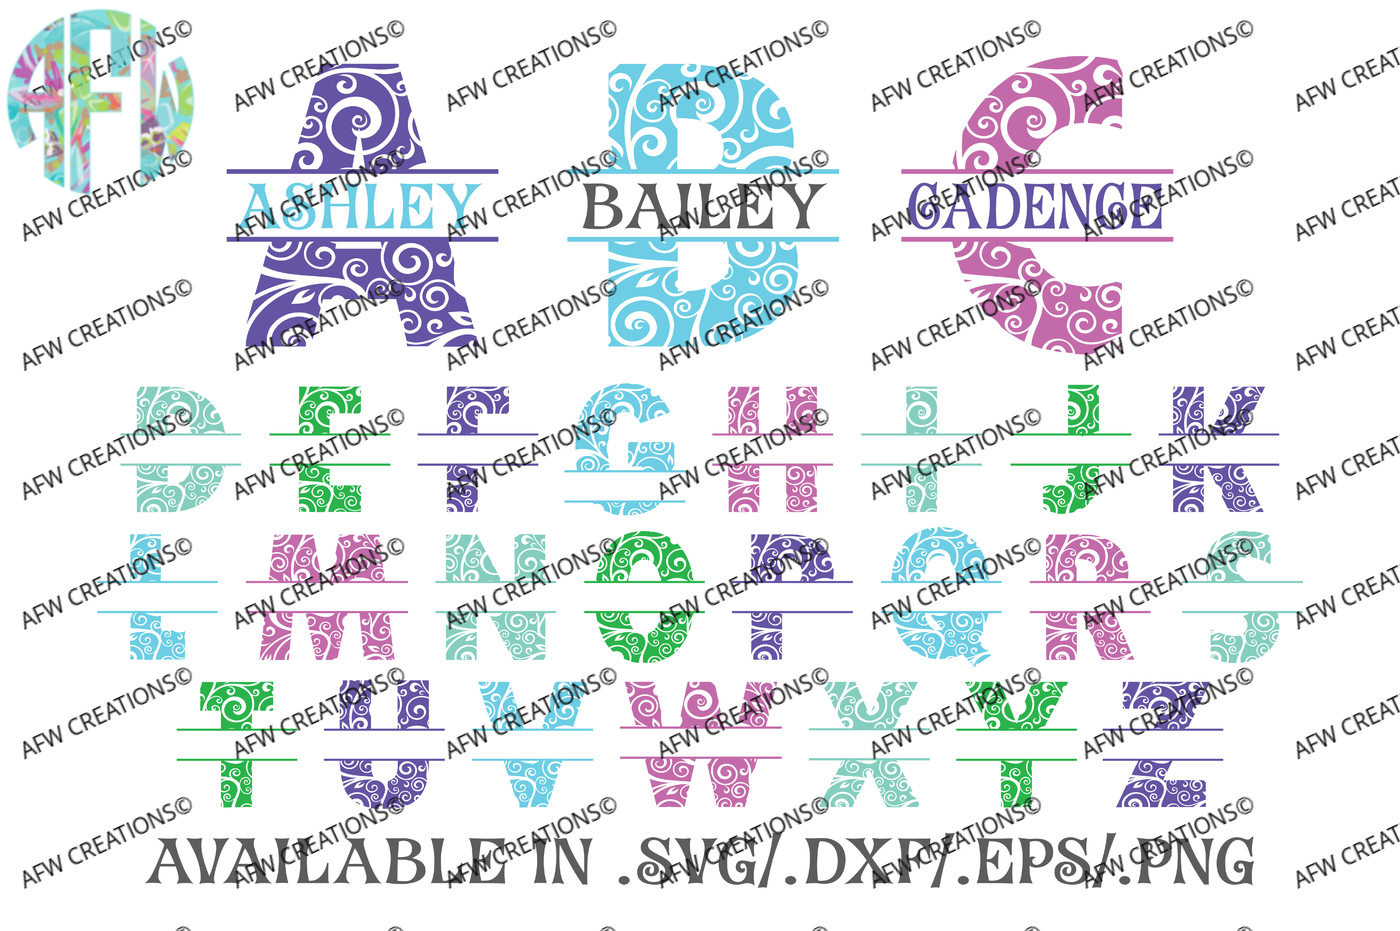 Split Swirl Ornament Letters Svg Dxf Eps Digital Cut Files By Afw Designs Thehungryjpeg Com